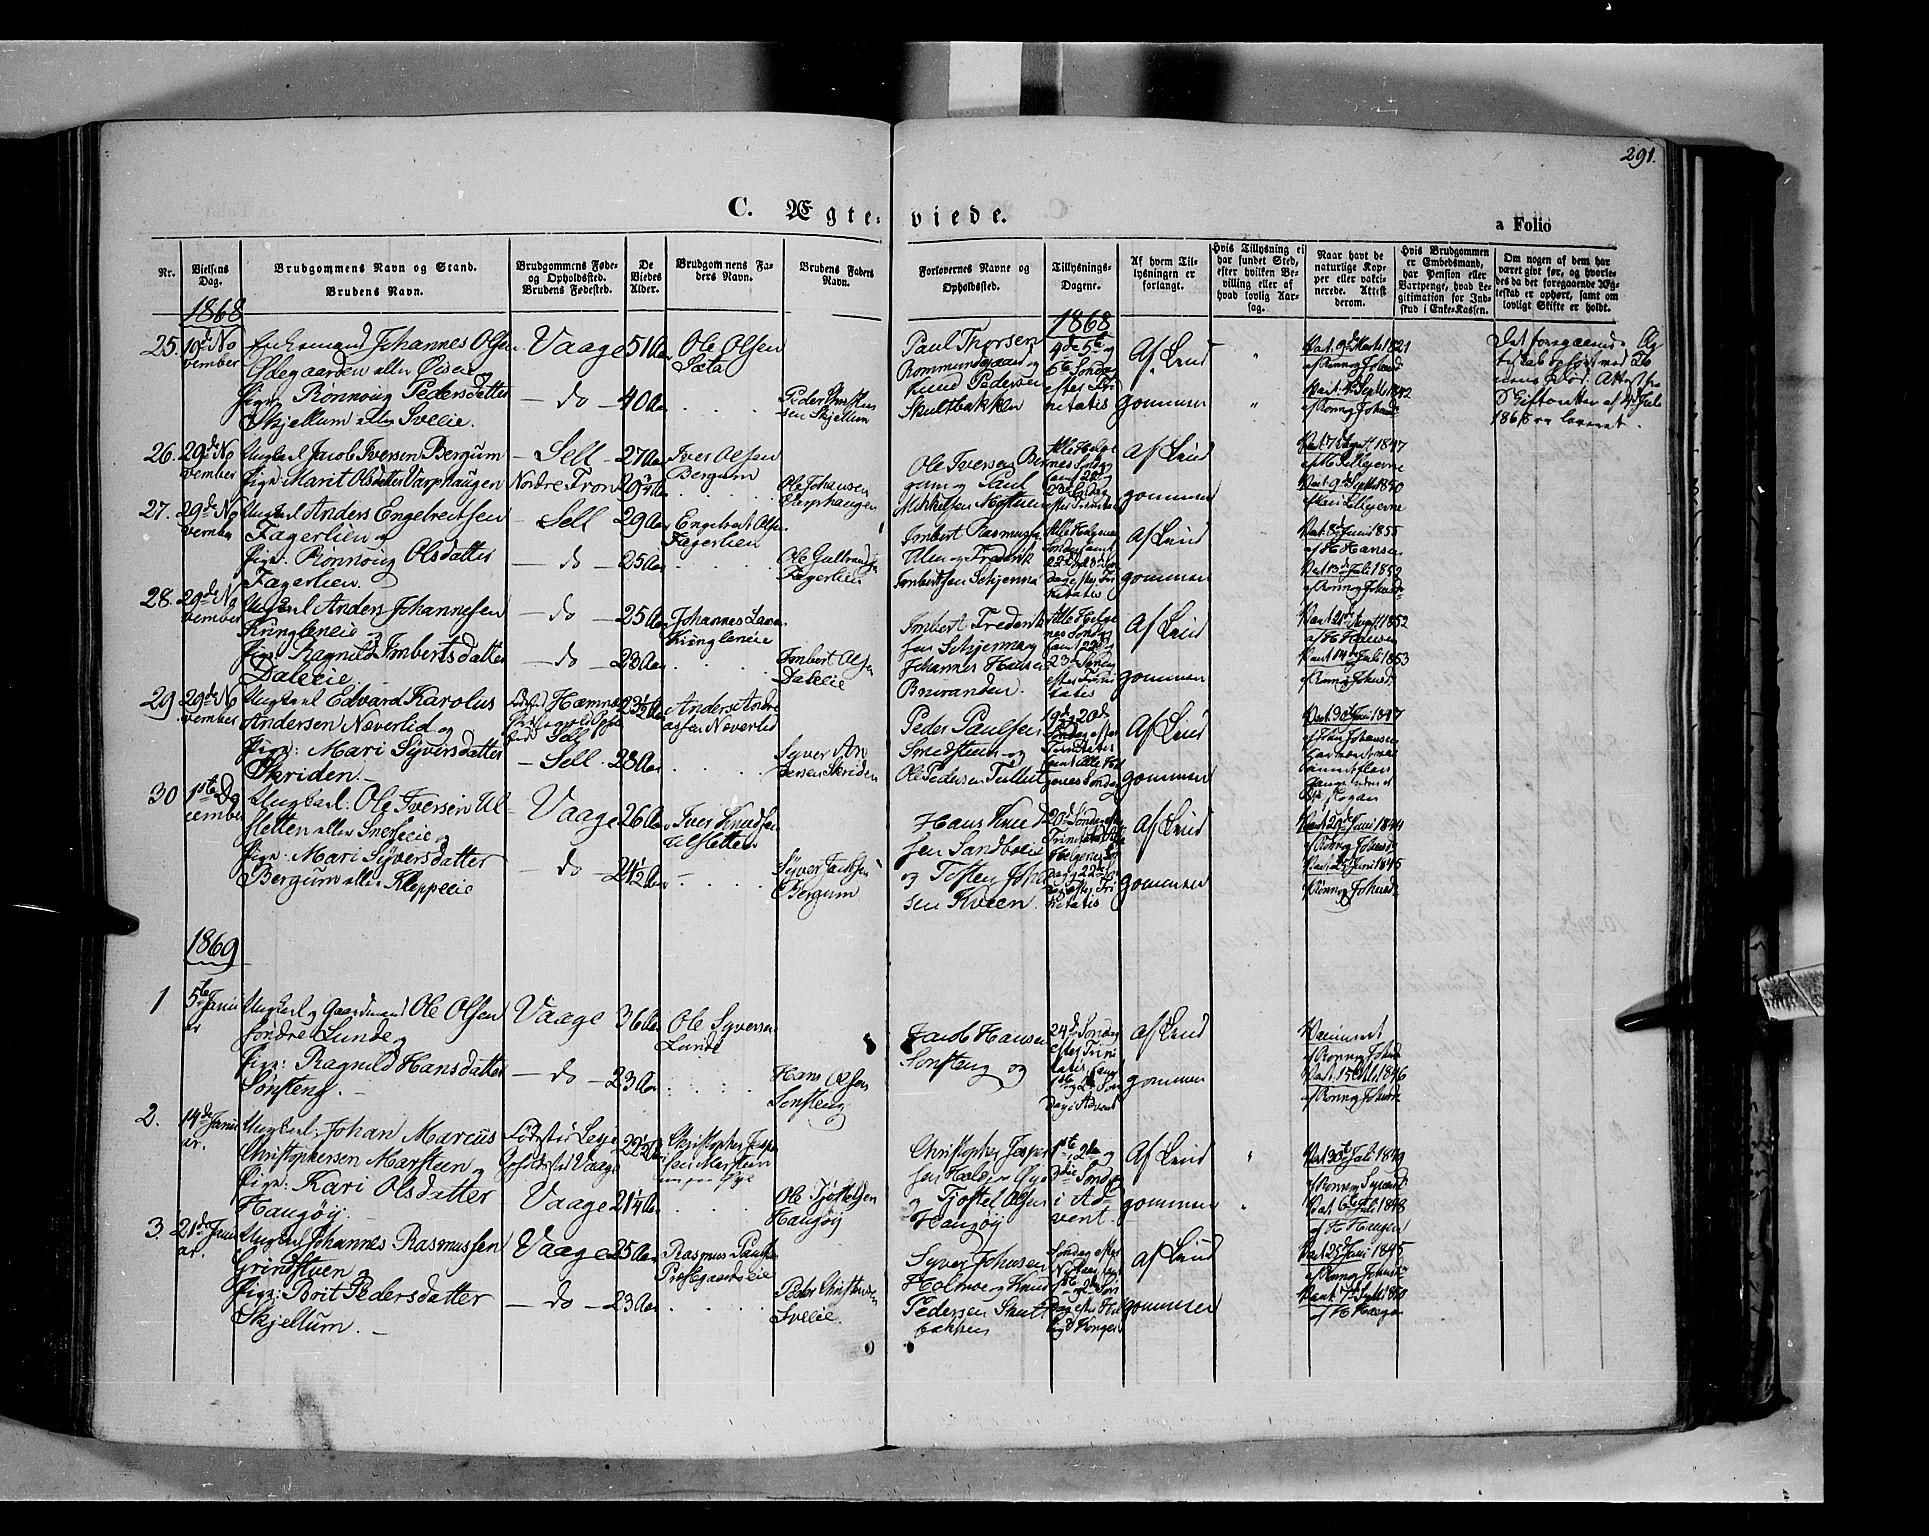 SAH, Vågå prestekontor, Ministerialbok nr. 6 /1, 1856-1872, s. 291